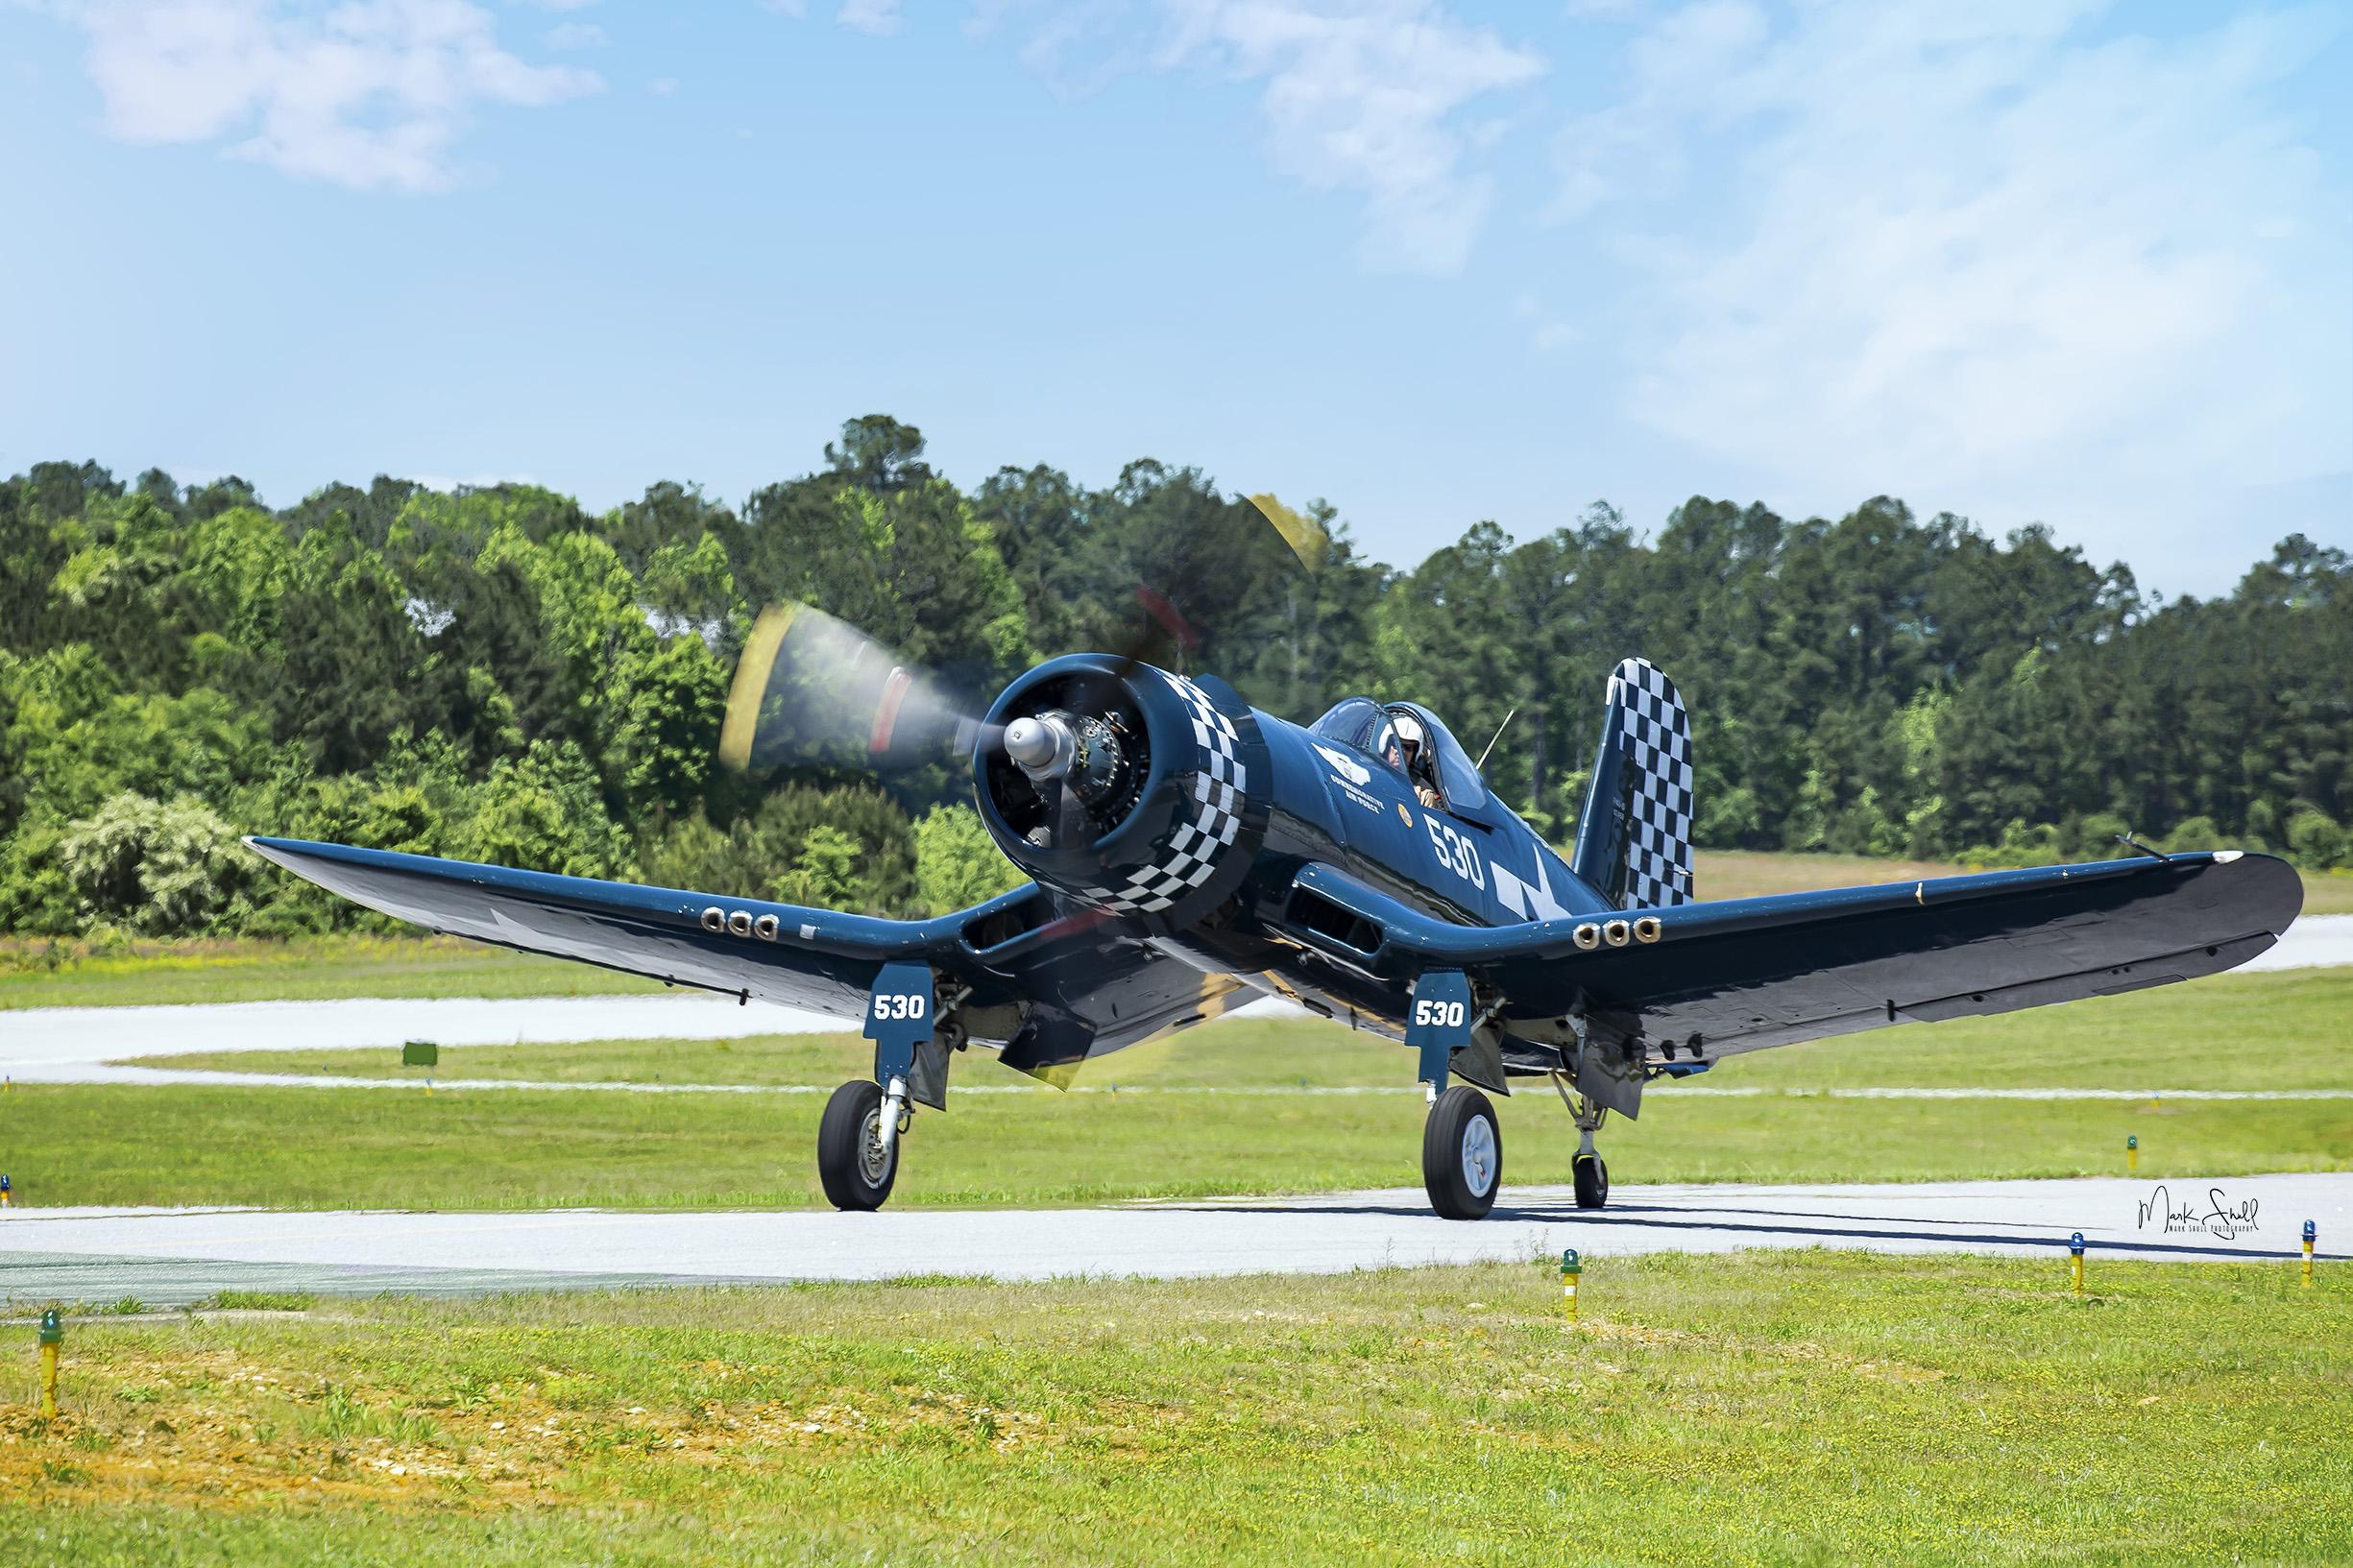 F4U - Corsair landing